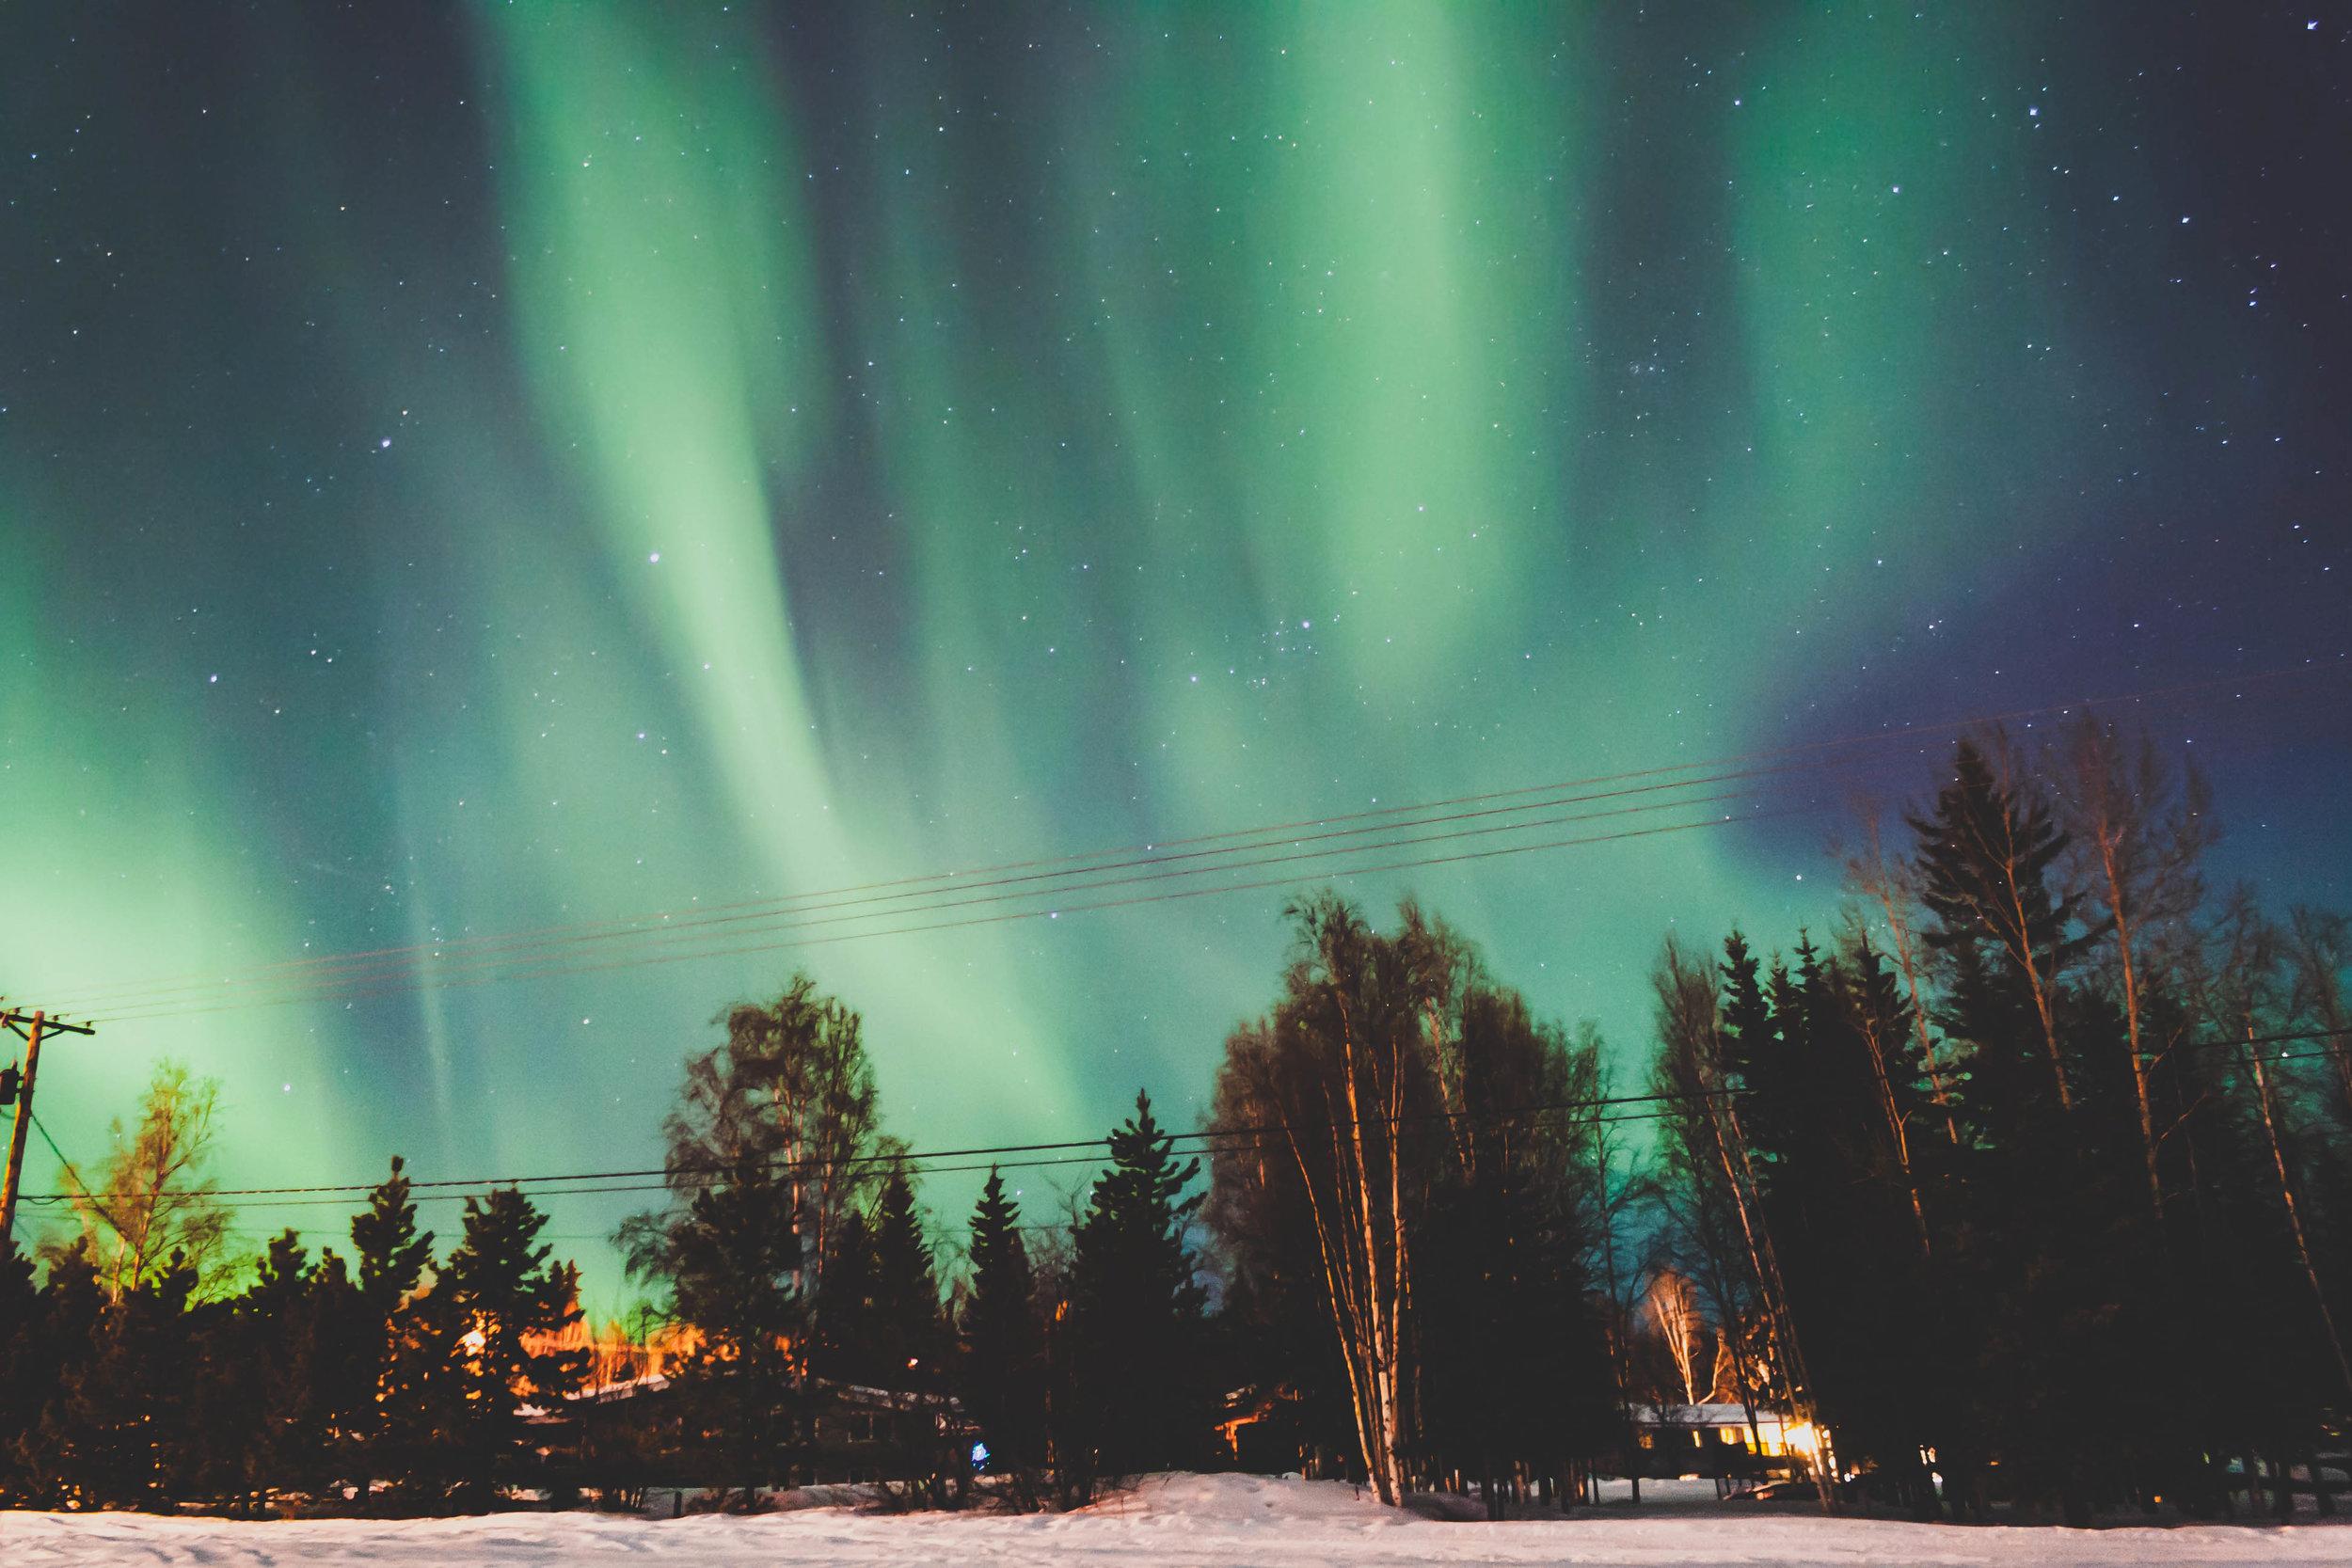 Fairbanks, Alaska. March 2014